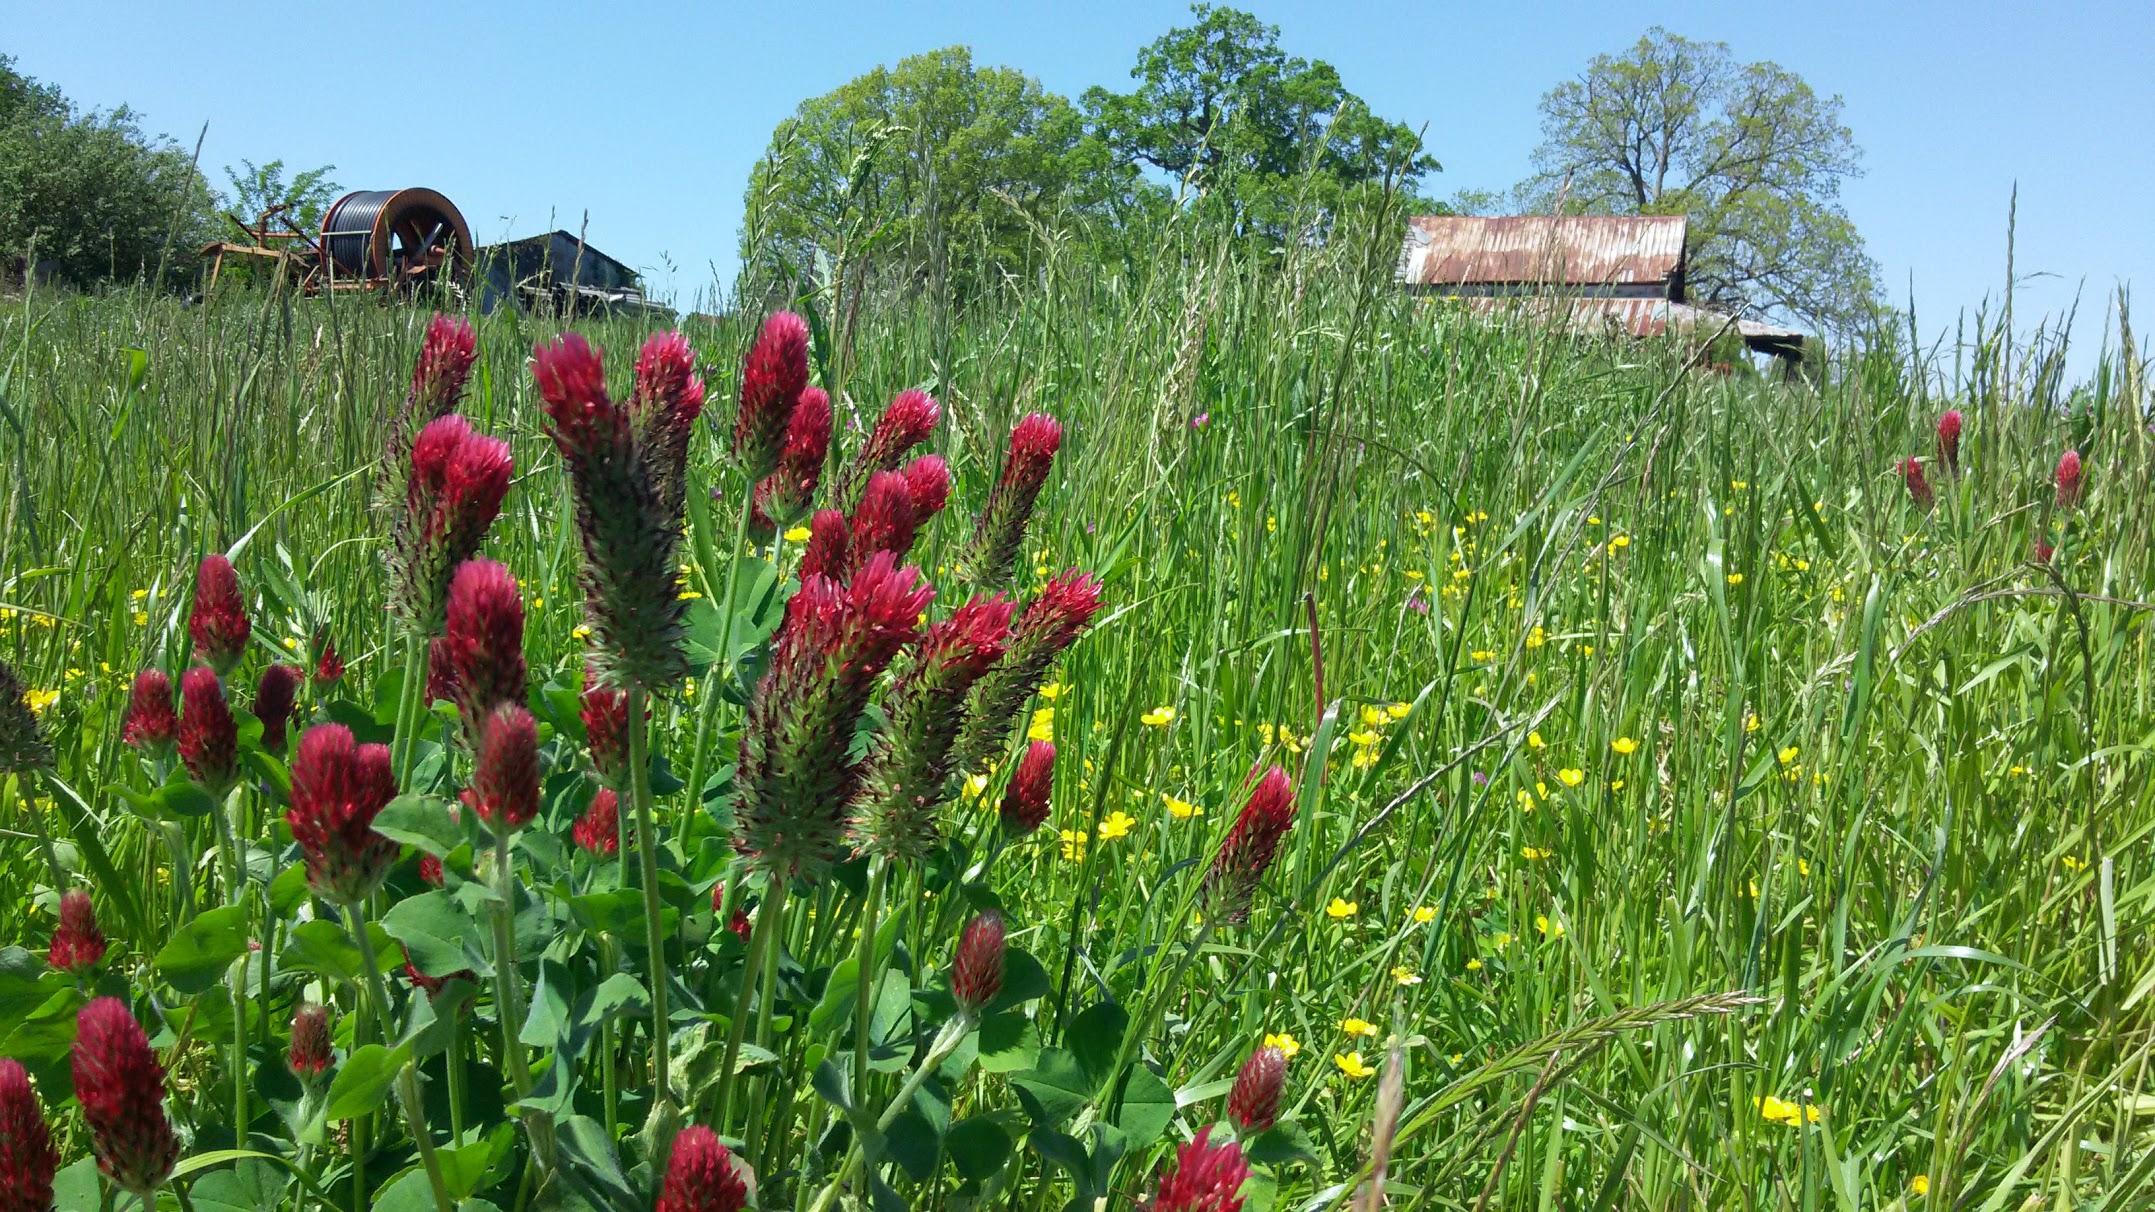 Crimson clover in field.